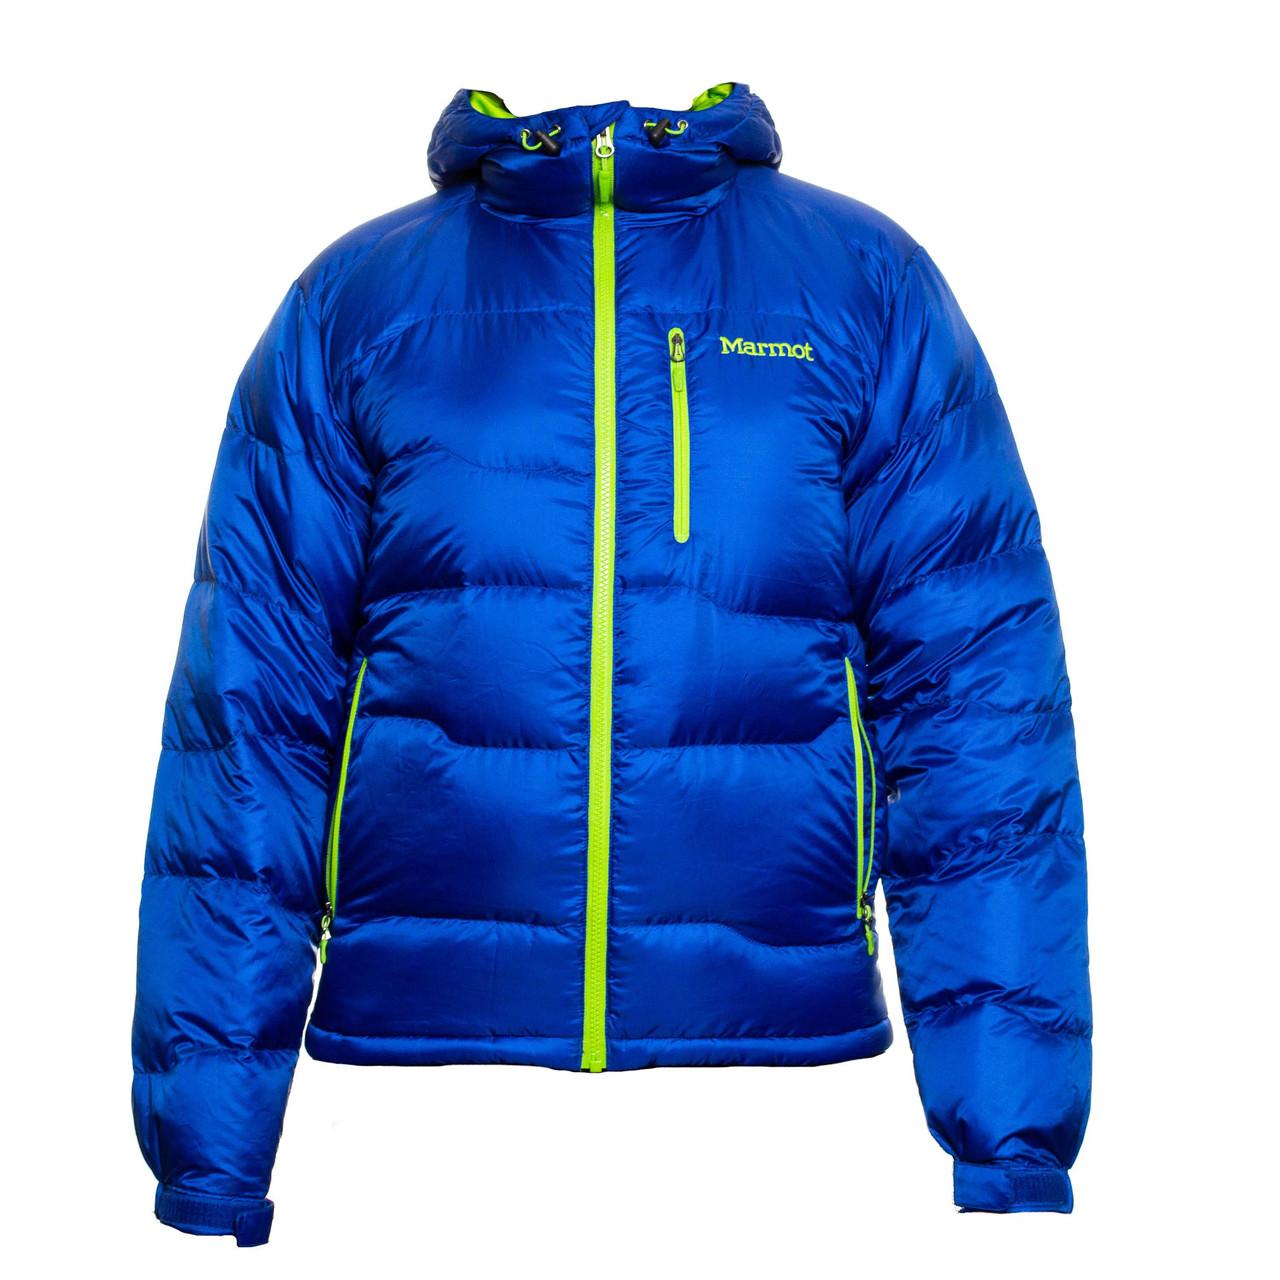 Чоловіча куртка Marmot Ama Dablam Blue S